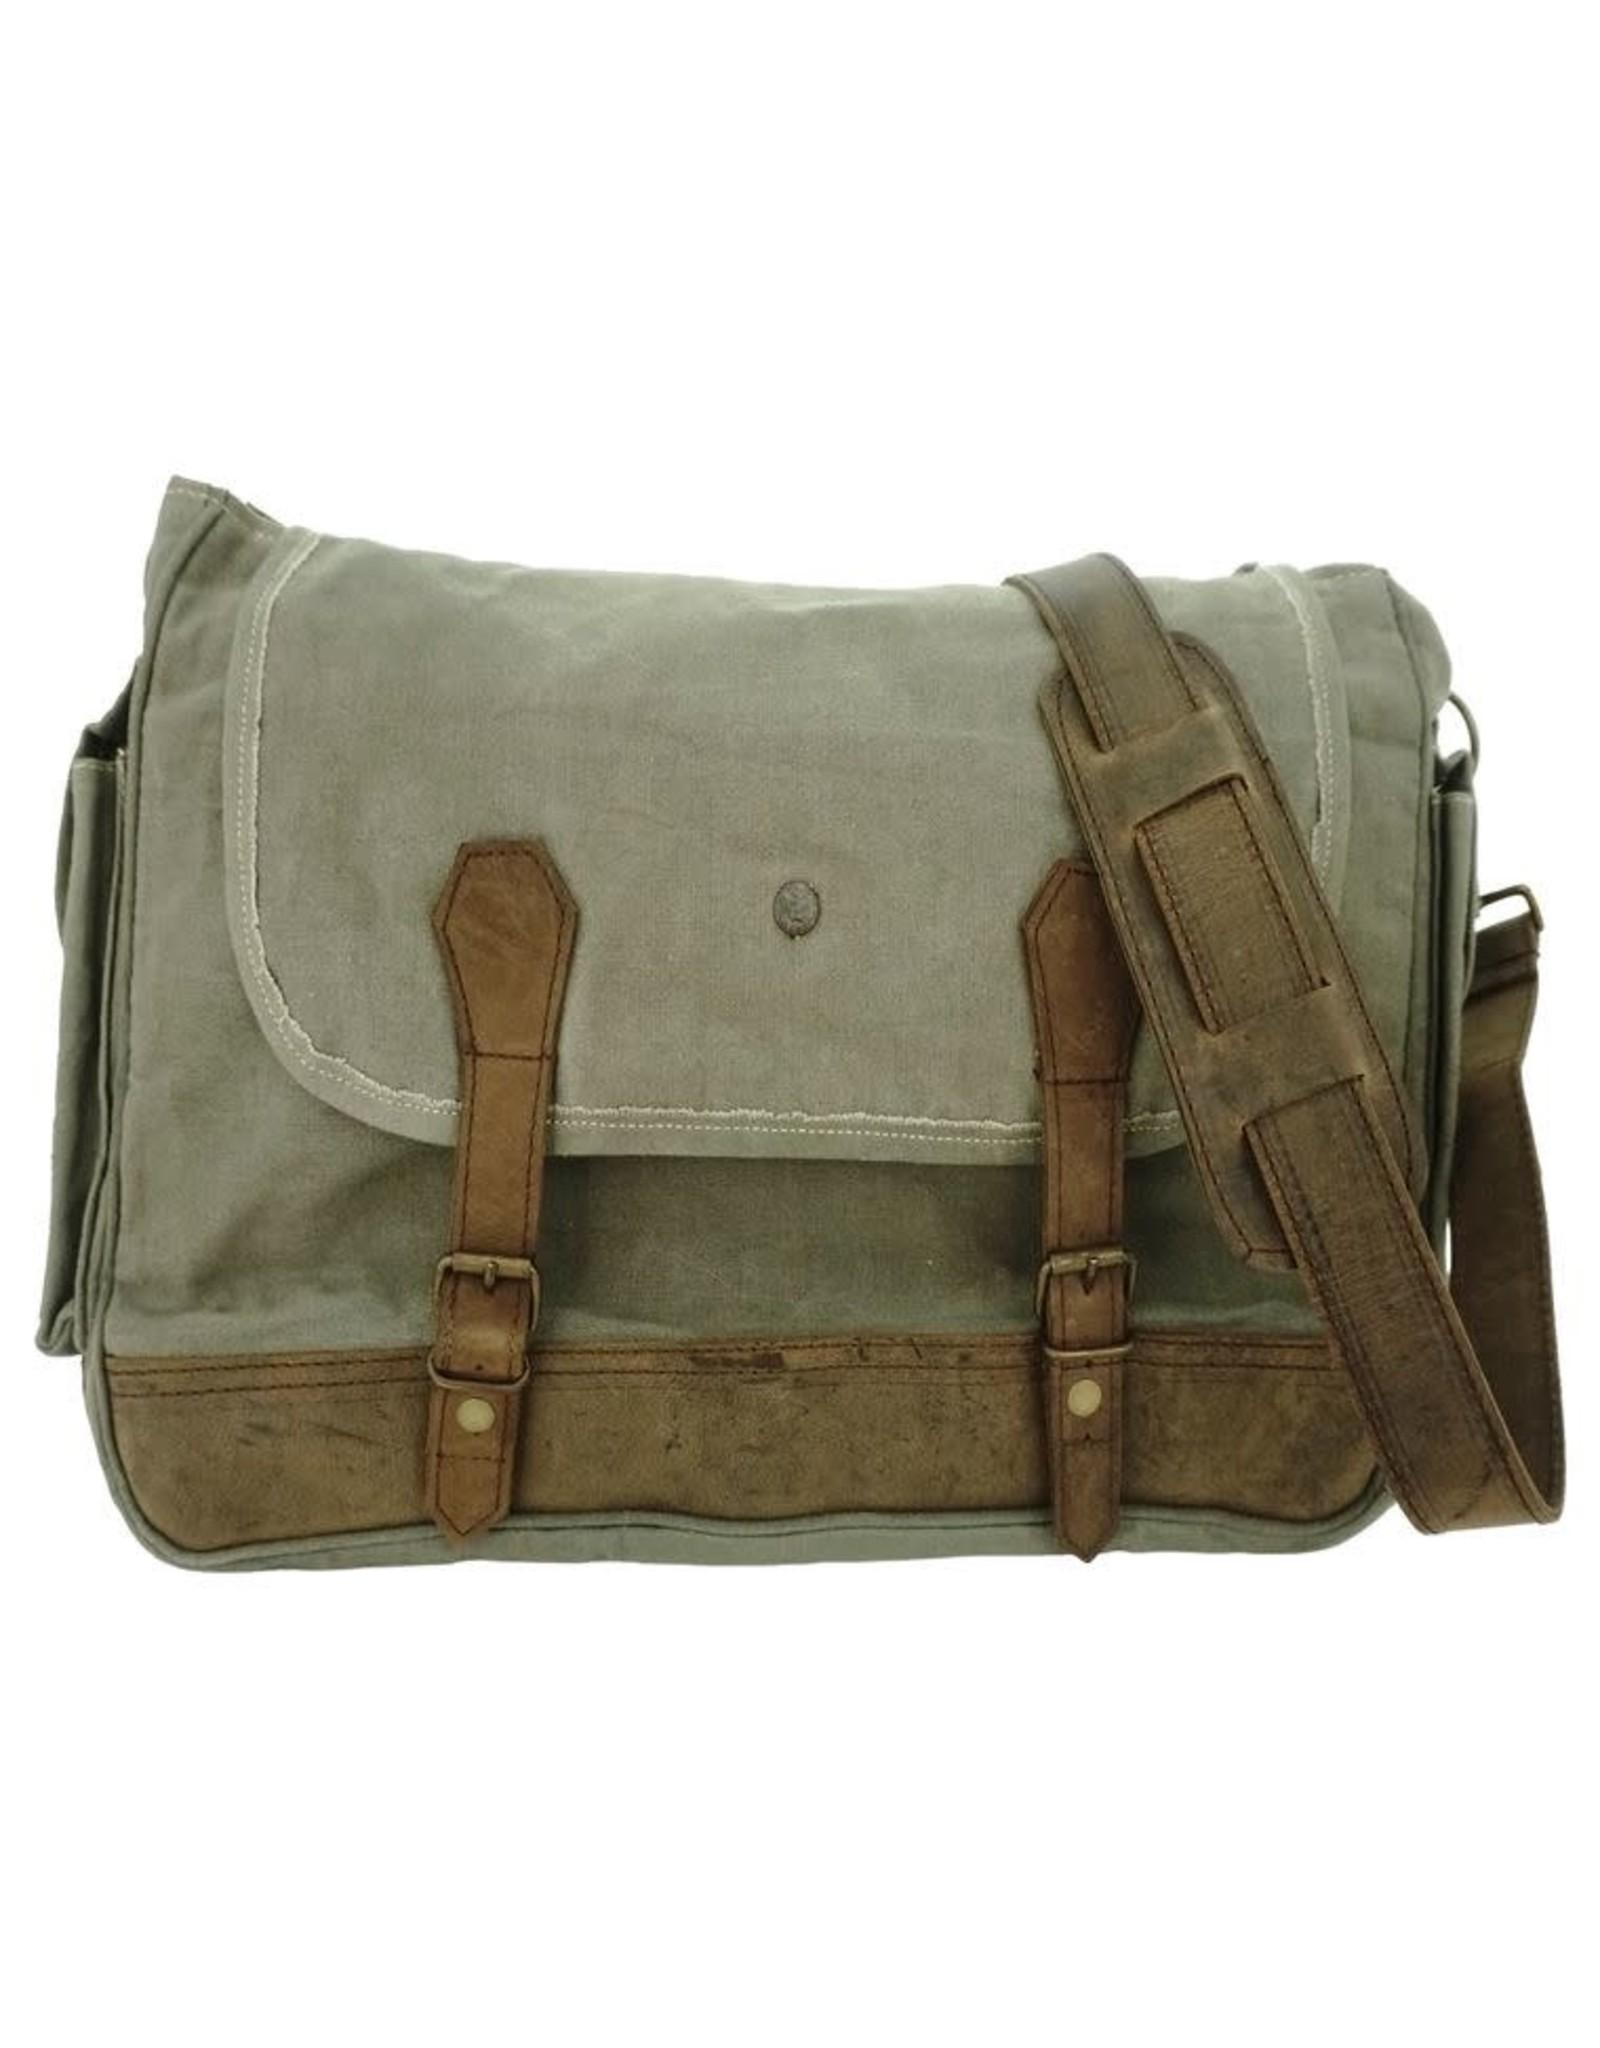 Vintage Addiction Military Tent Crossbody/Messenger Bag - Olive